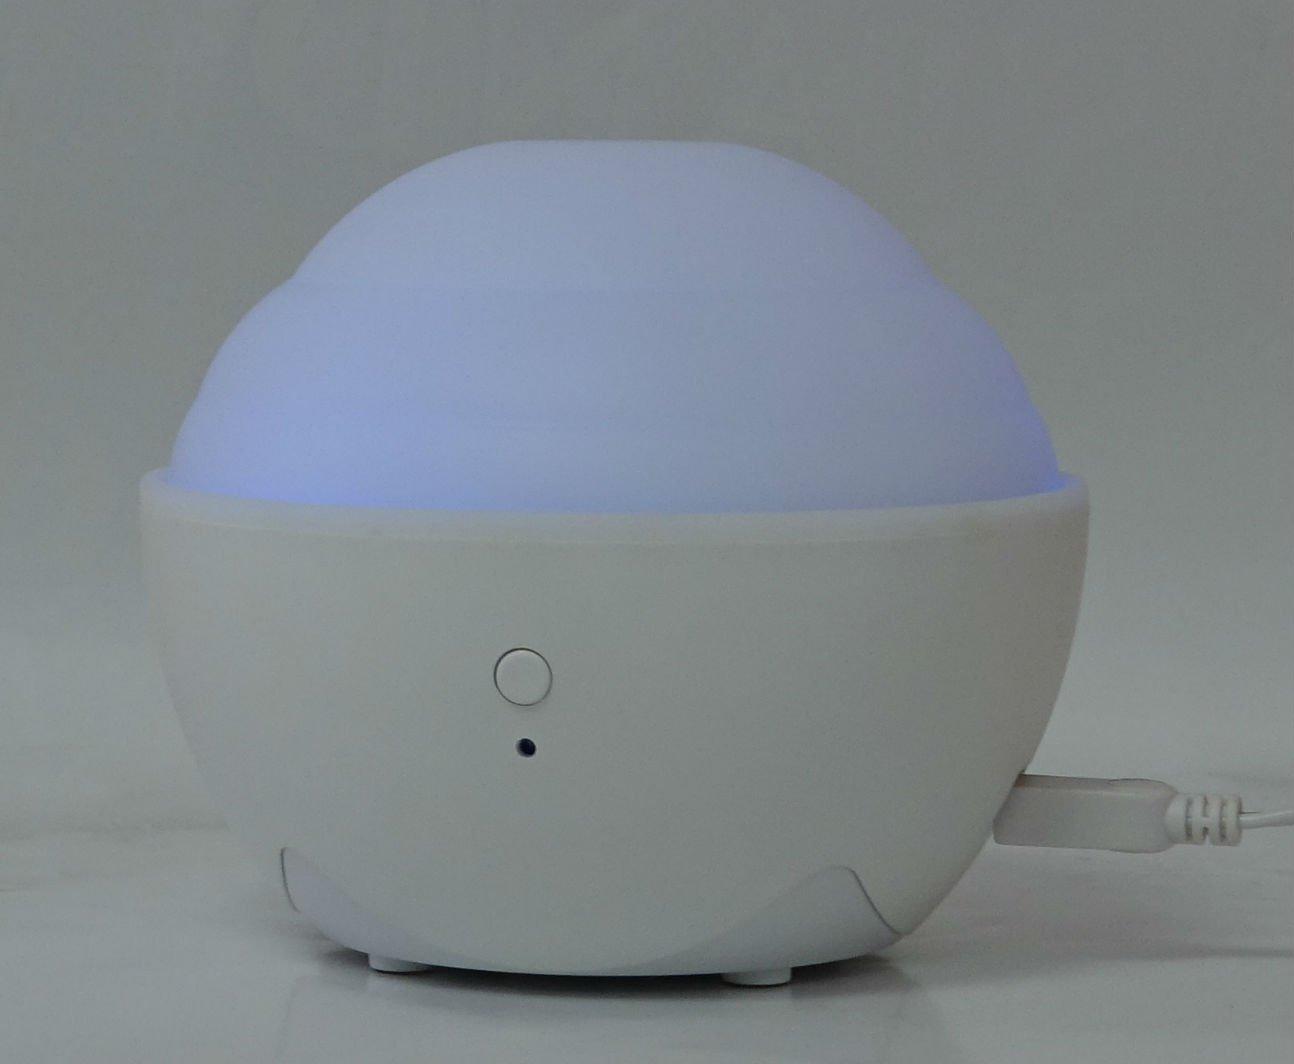 ZAQ Mini II USB Travel Litemist Aromatherapy Essential Oil Diffuser, White (Old Version)